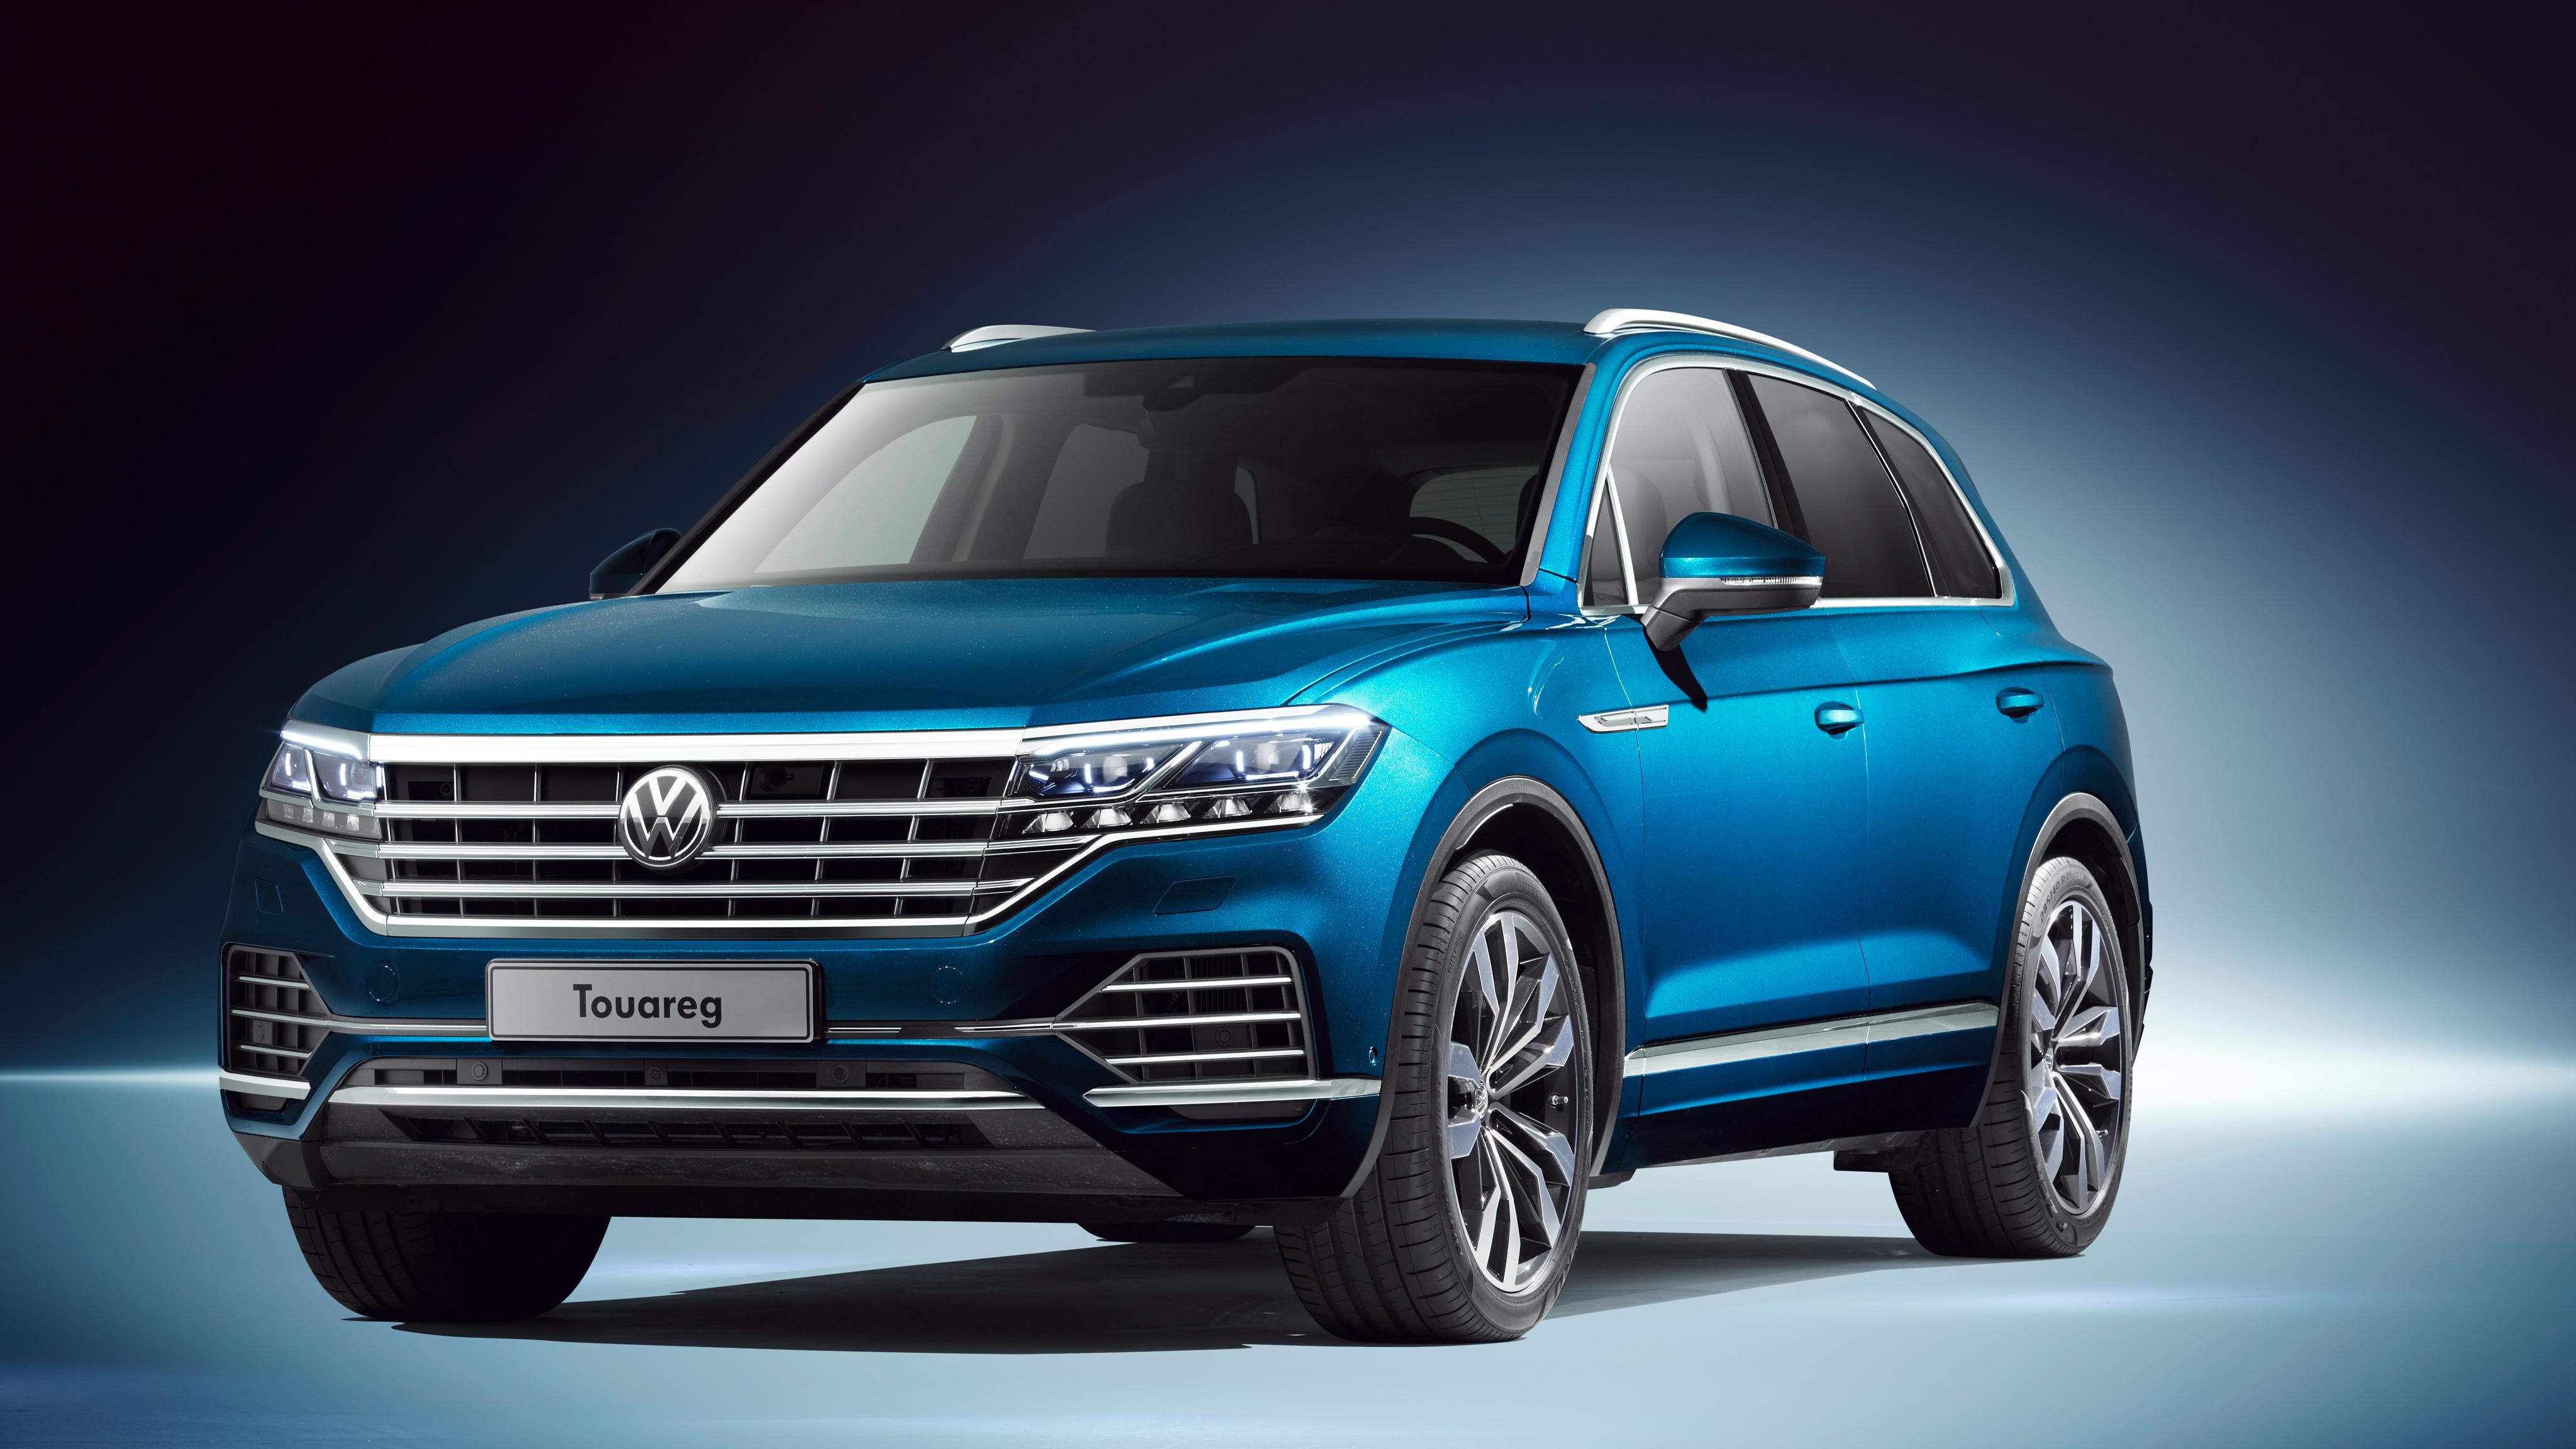 2018 Volkswagen Touareg V6 TDi 4K 3 Wallpaper HD Car Wallpapers 4096x2304